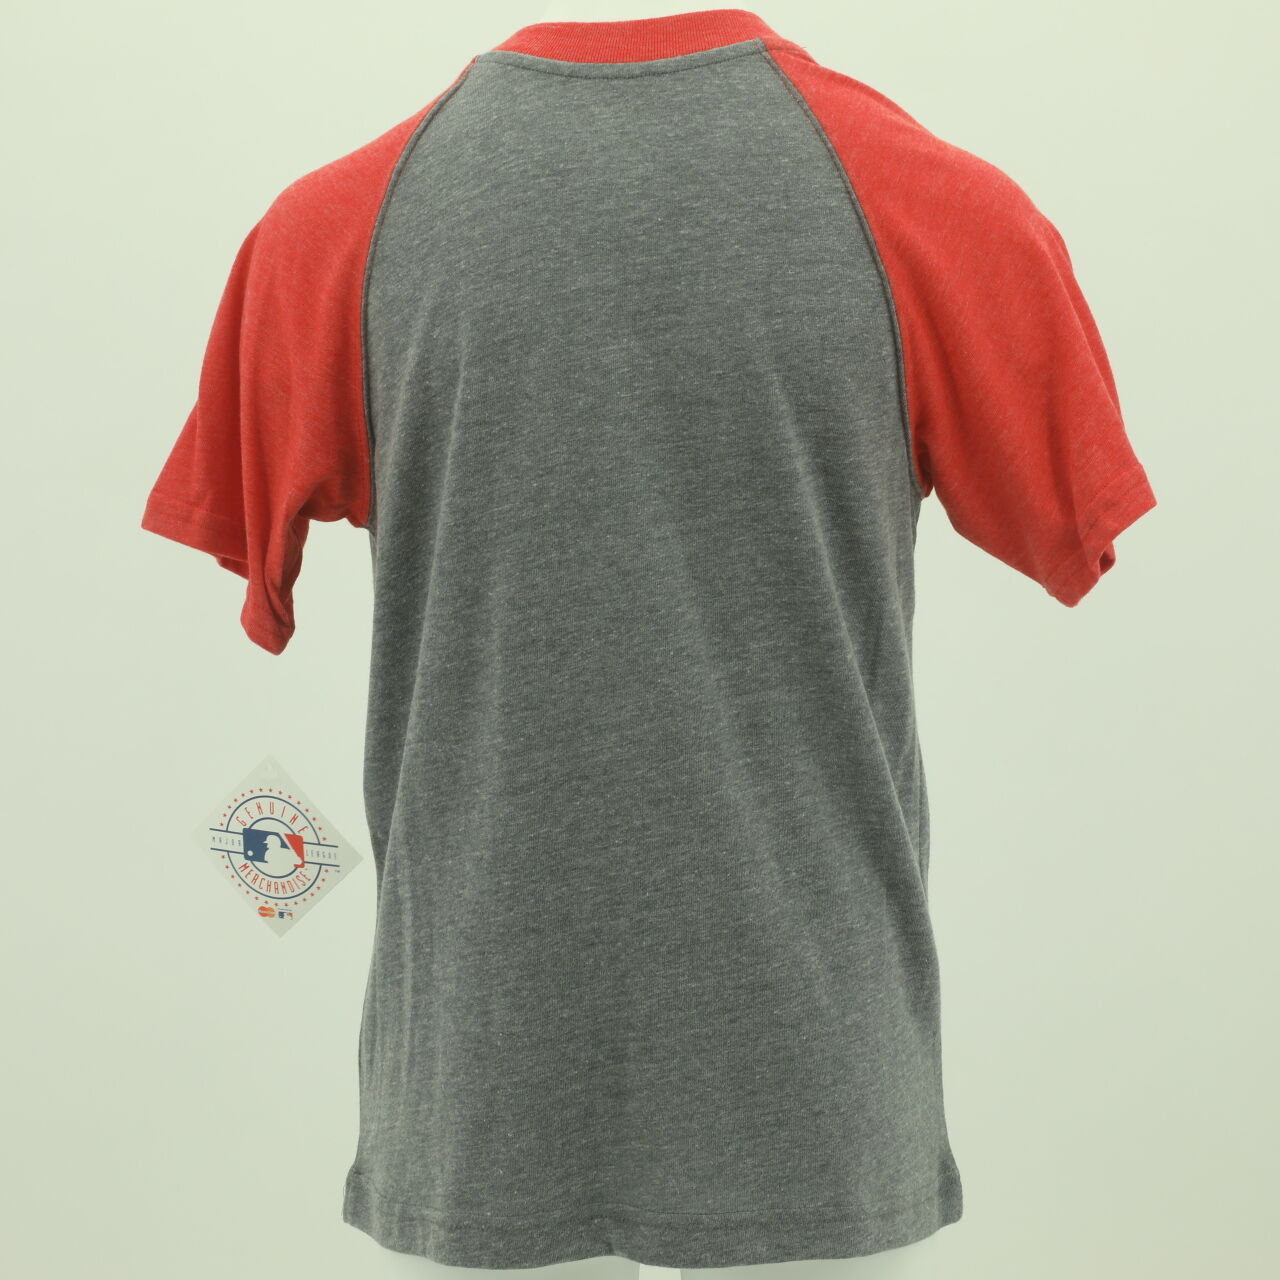 Cincinnati Reds baseball Official Merchandise MLB Youth T-Shirt Raised  Letters 2edbad7631f